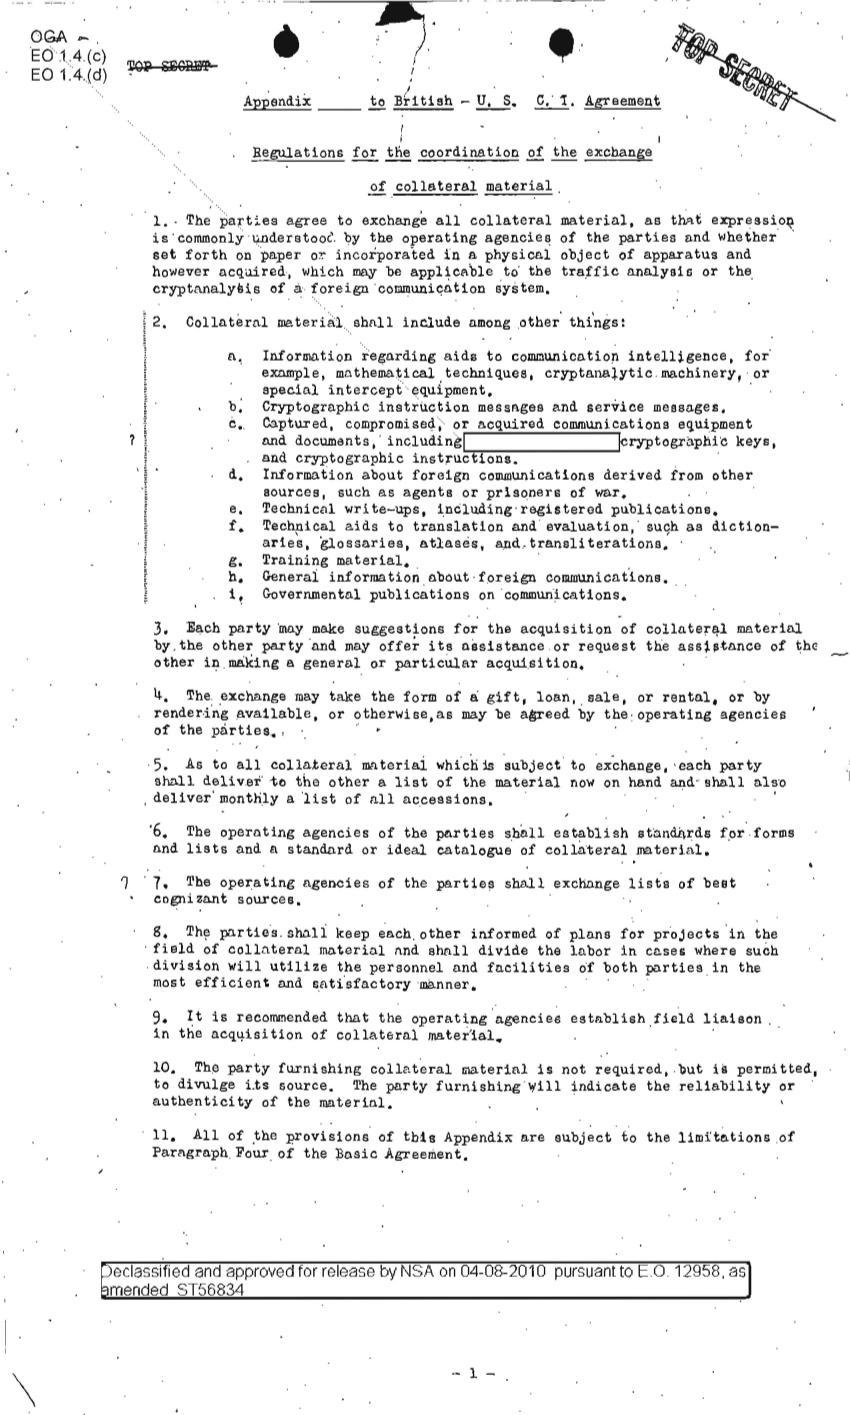 APPENDIX_CI_AGREE_NOTDATED.PDF